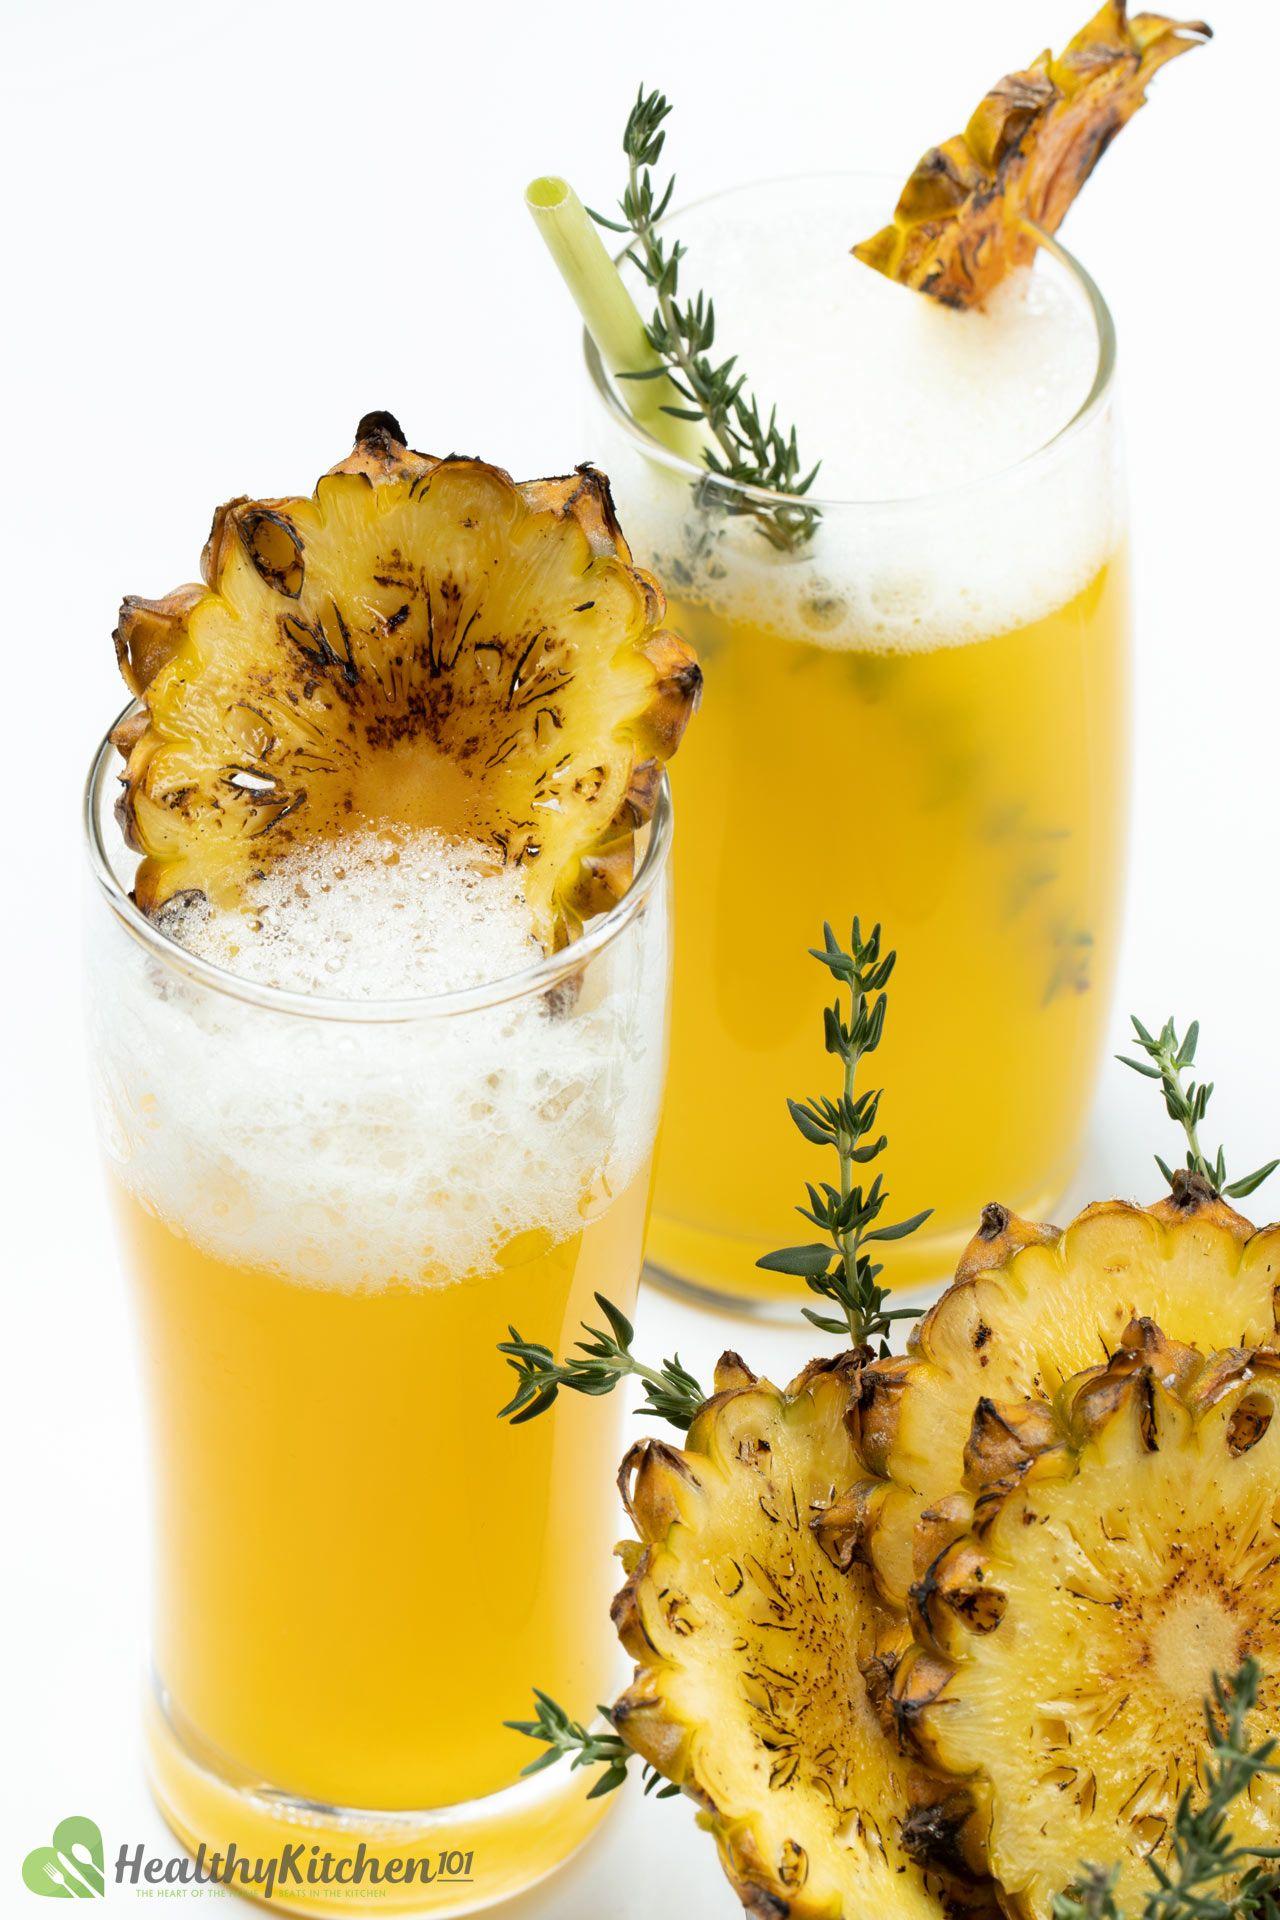 Vodka and Pineapple Juice Recipe